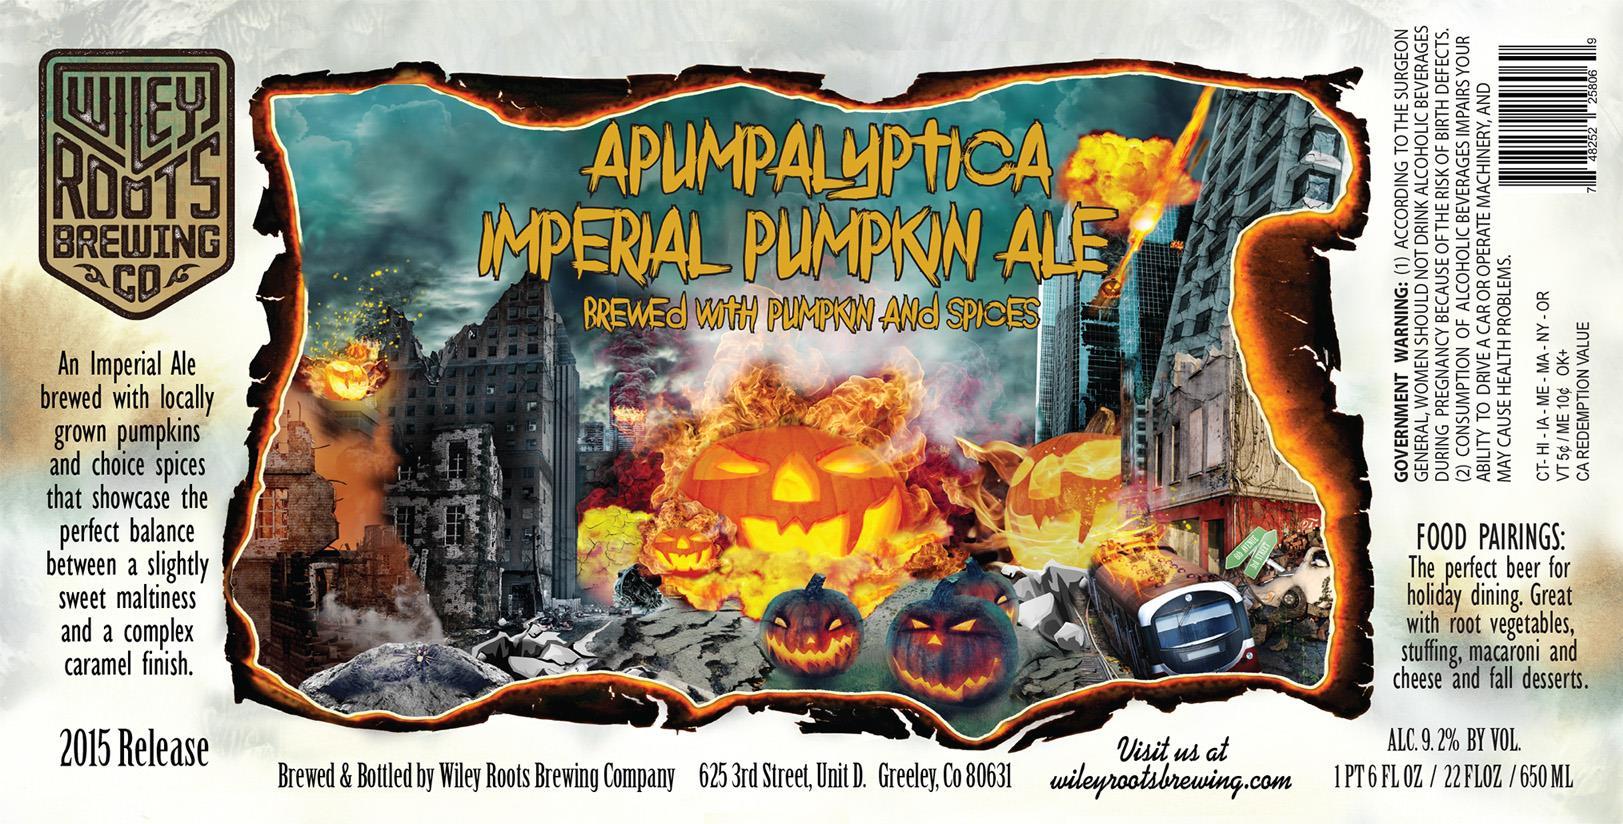 APUMPALYPTICA-IMPERIAL-PUMPKIN-ALE